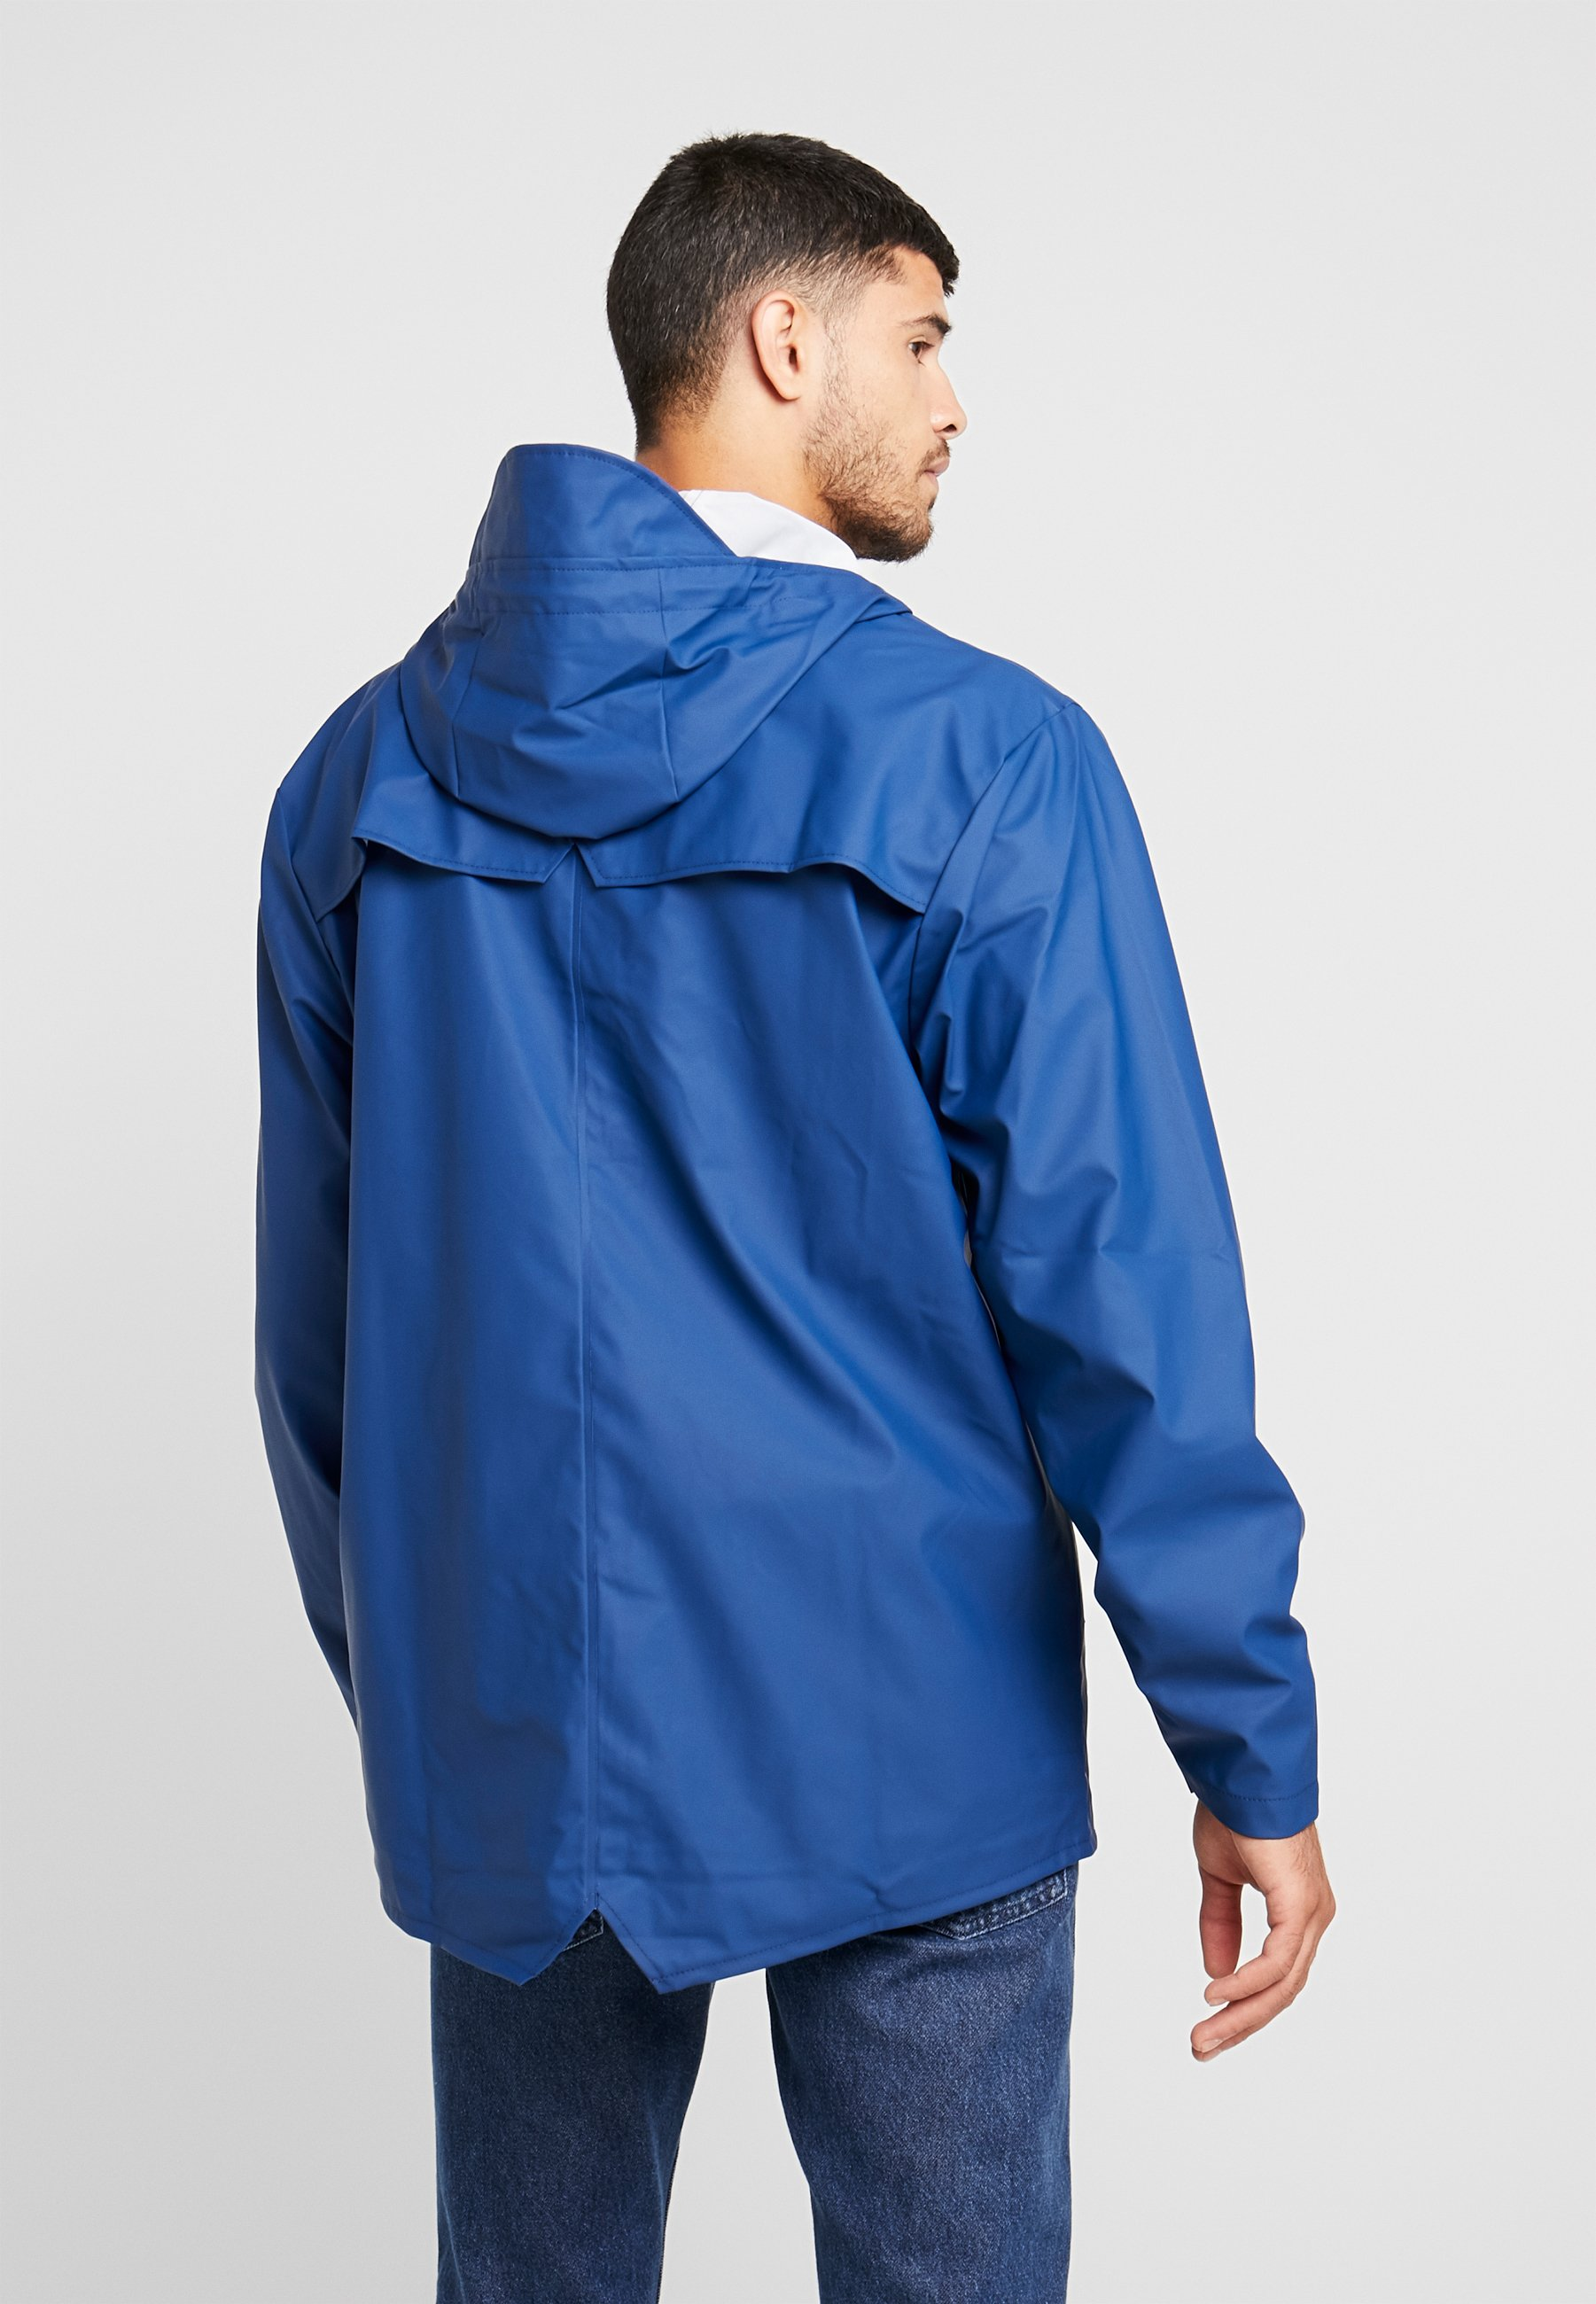 Rains Jacket - Regenjas Blue 7i5K5wr0 wMUcTwHz